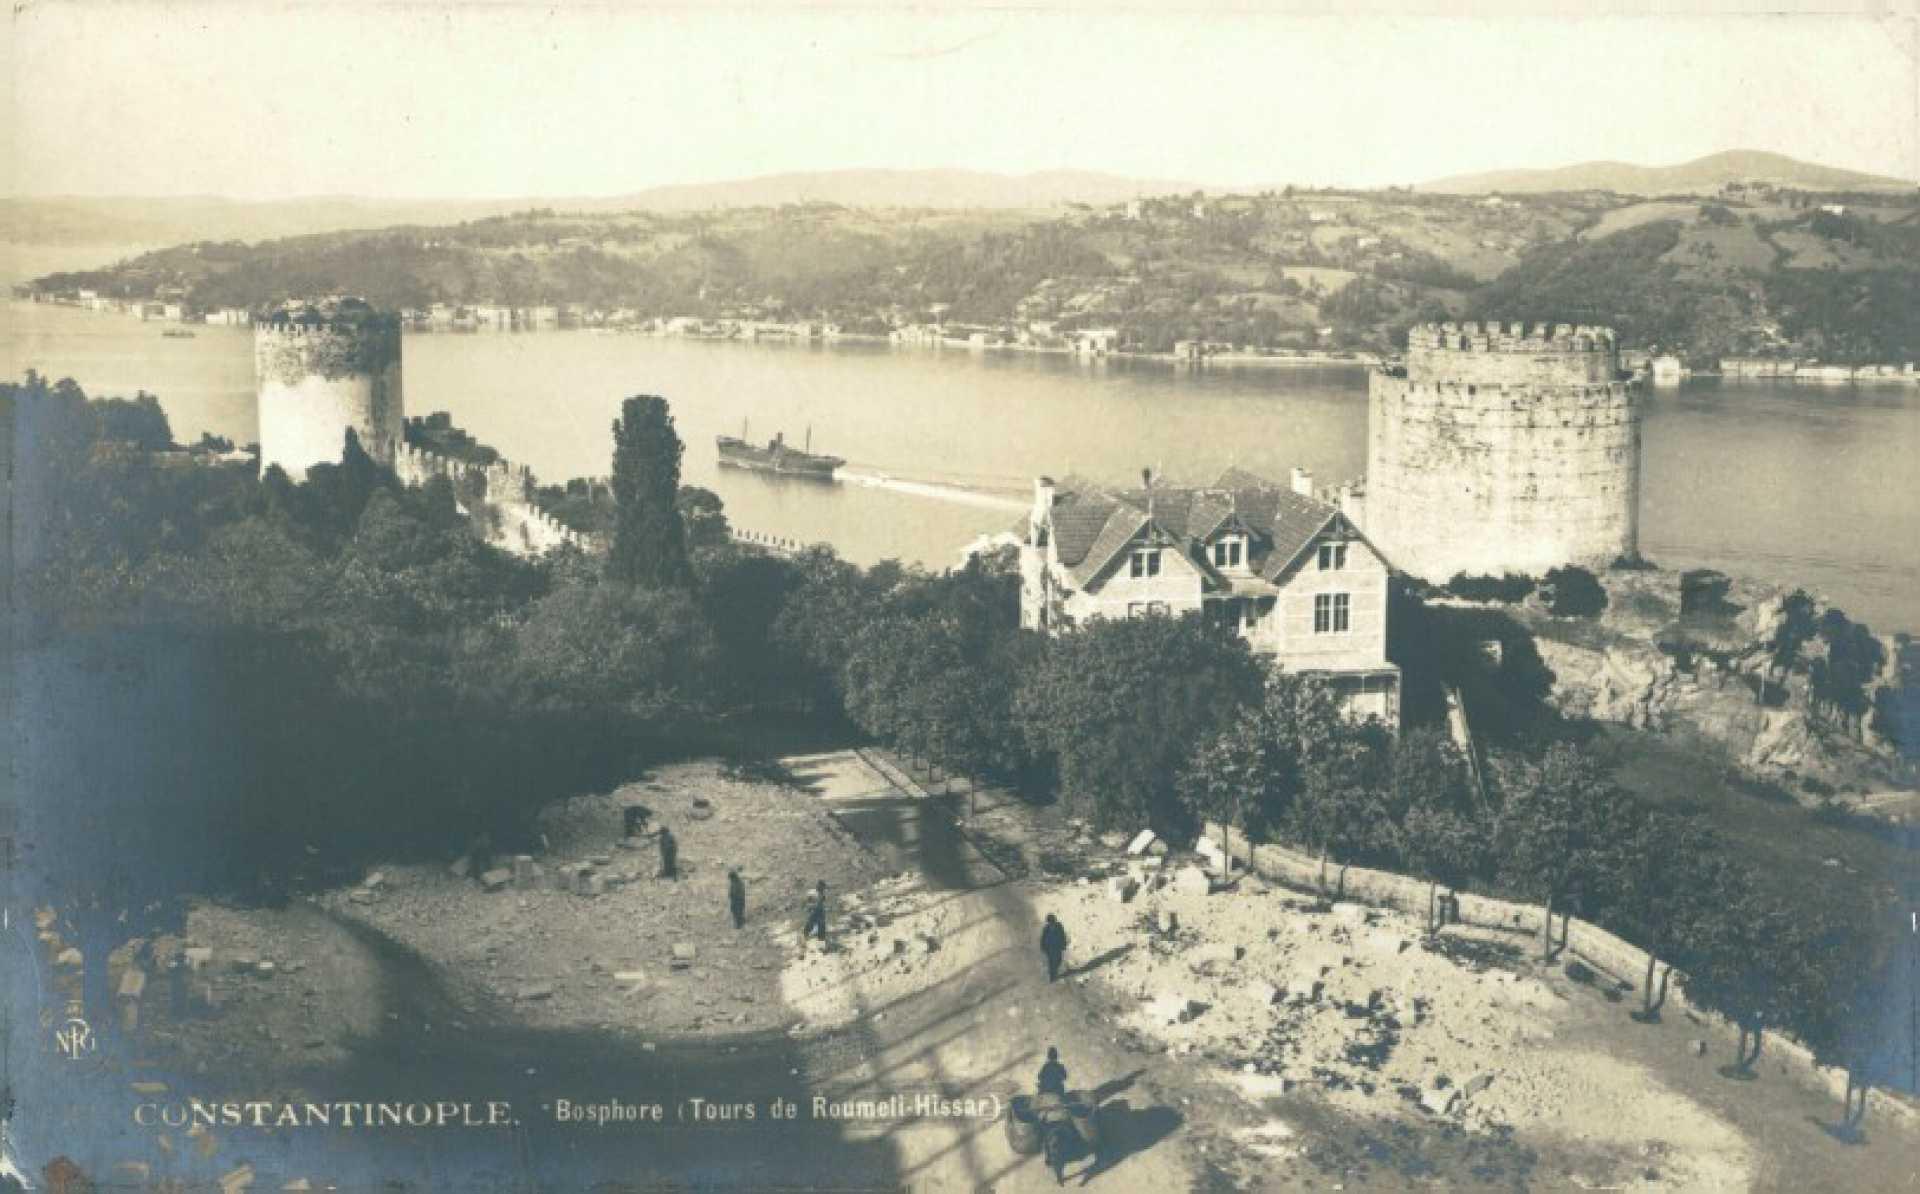 Bosphore (Tours de Roumeli-Hissar)